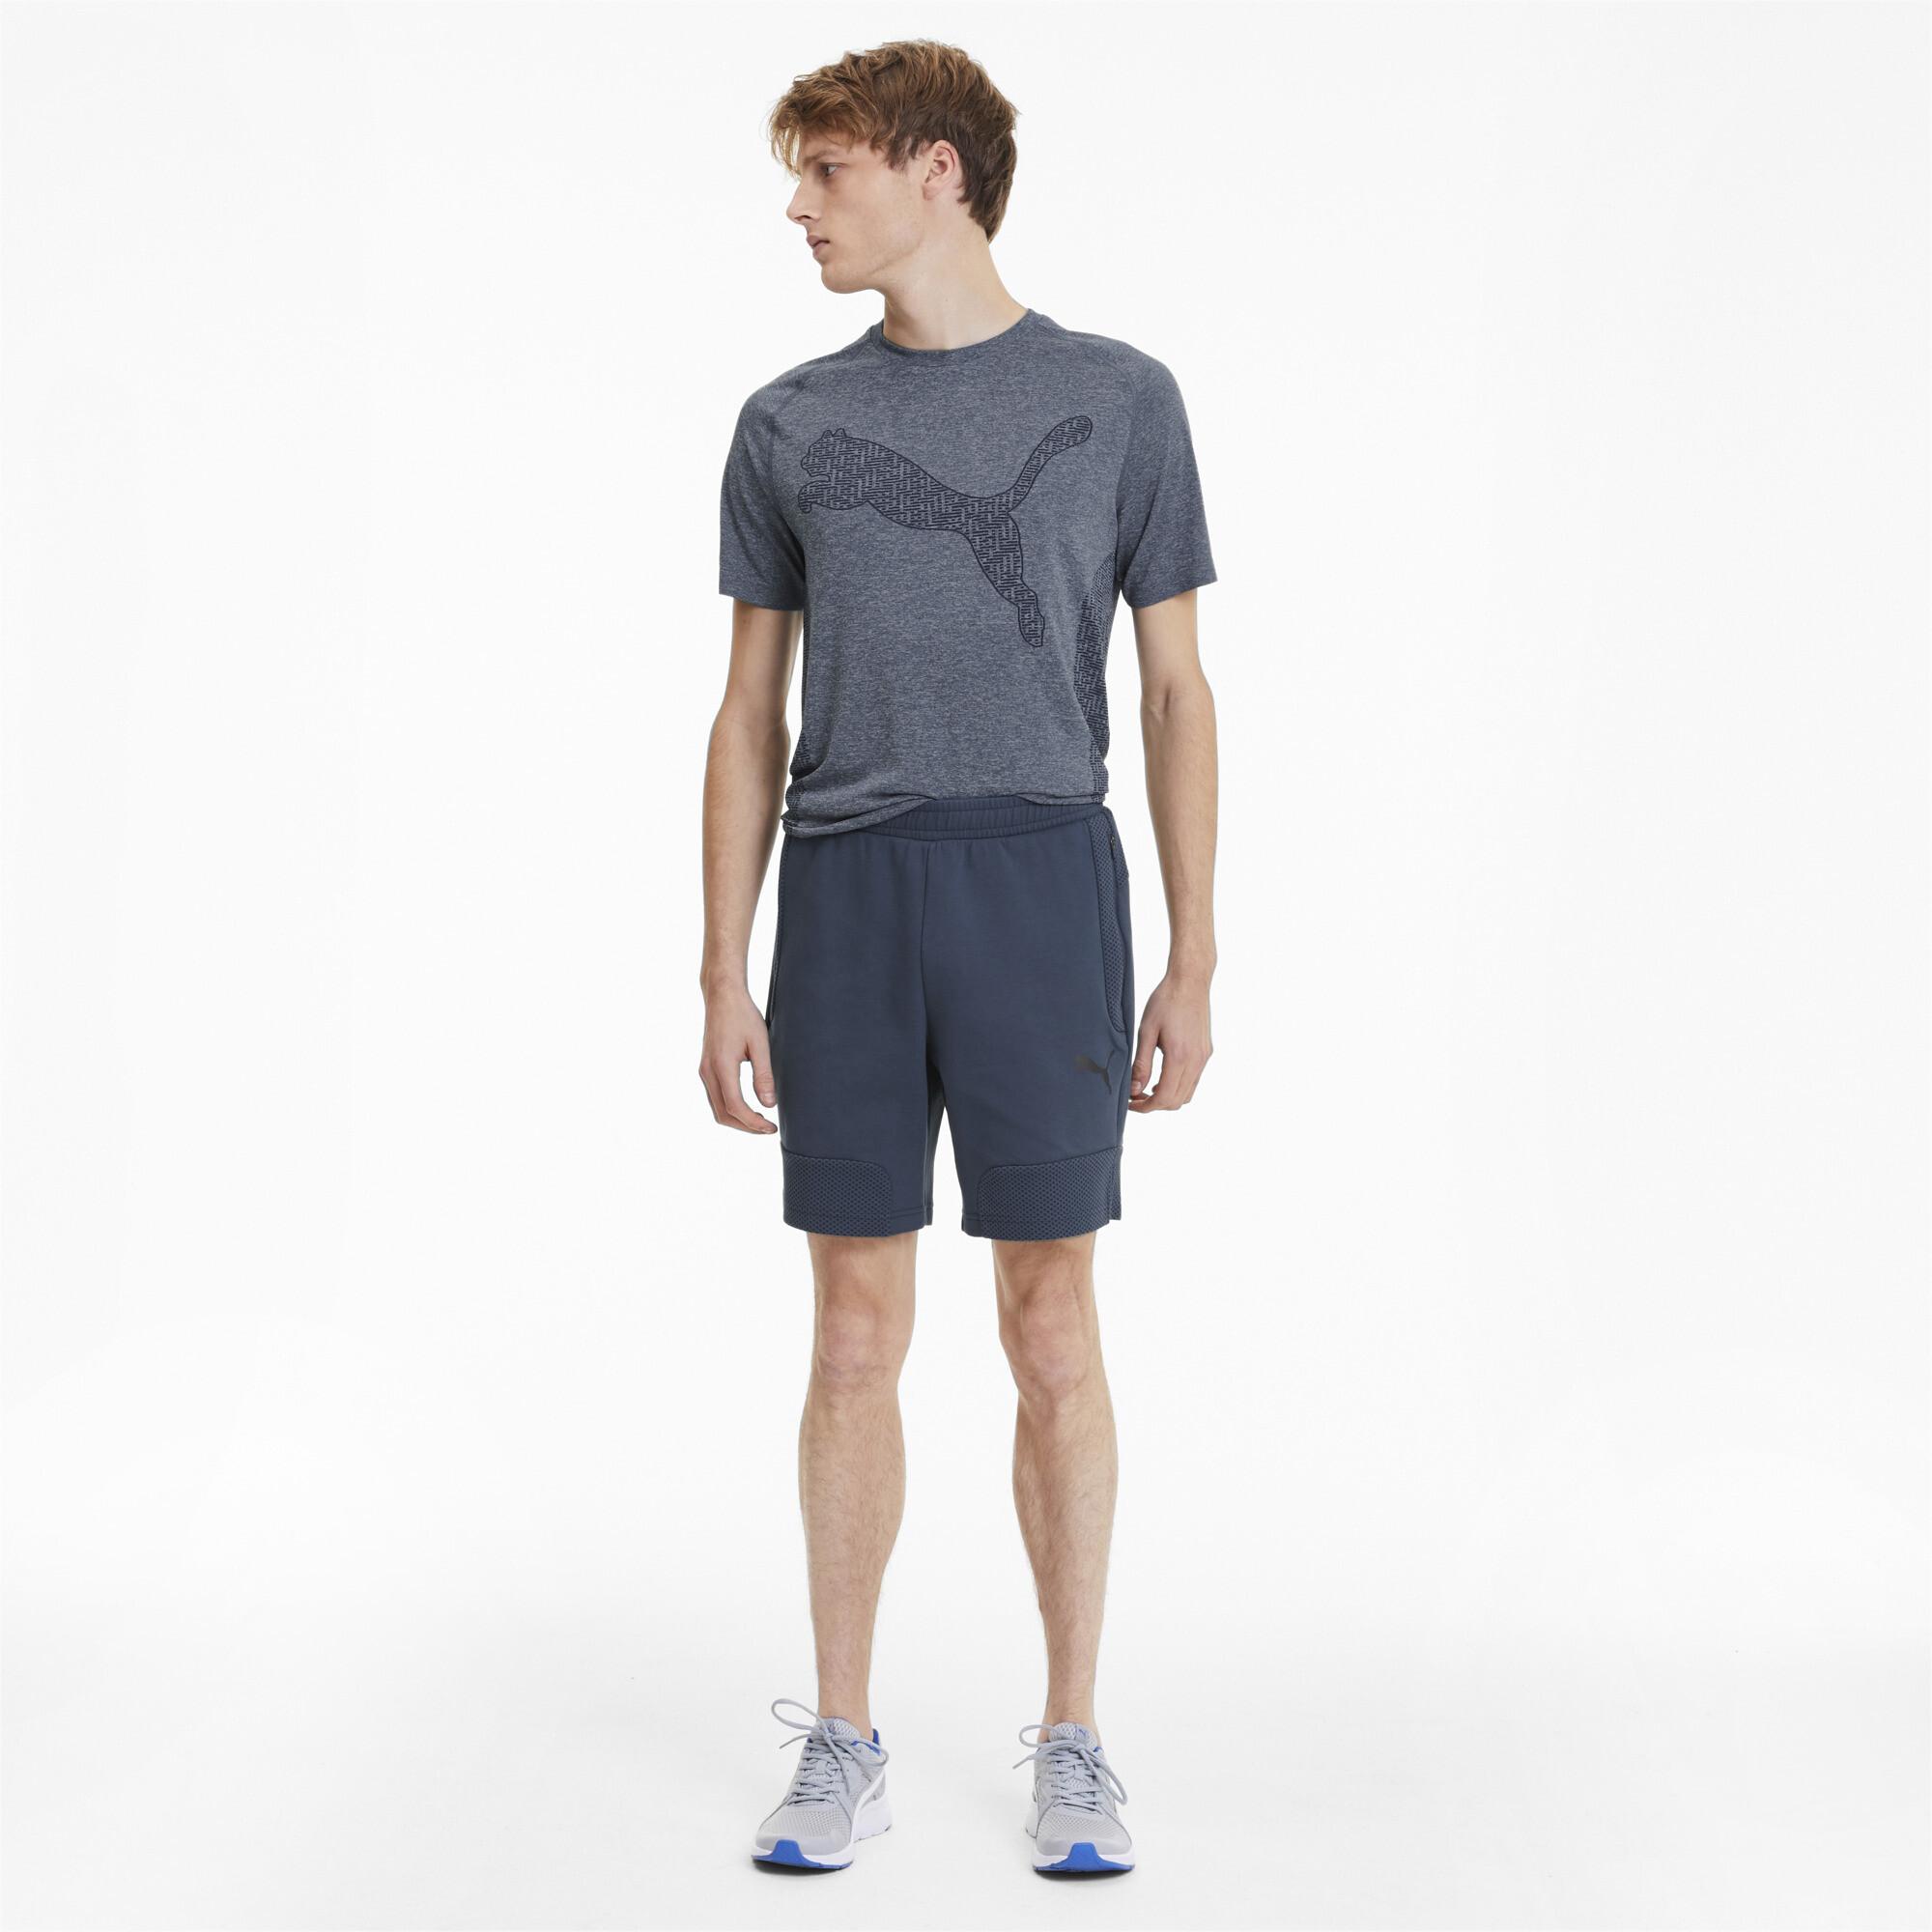 PUMA-Evostripe-Men-039-s-Shorts-Men-Knitted-Shorts-Basics thumbnail 11